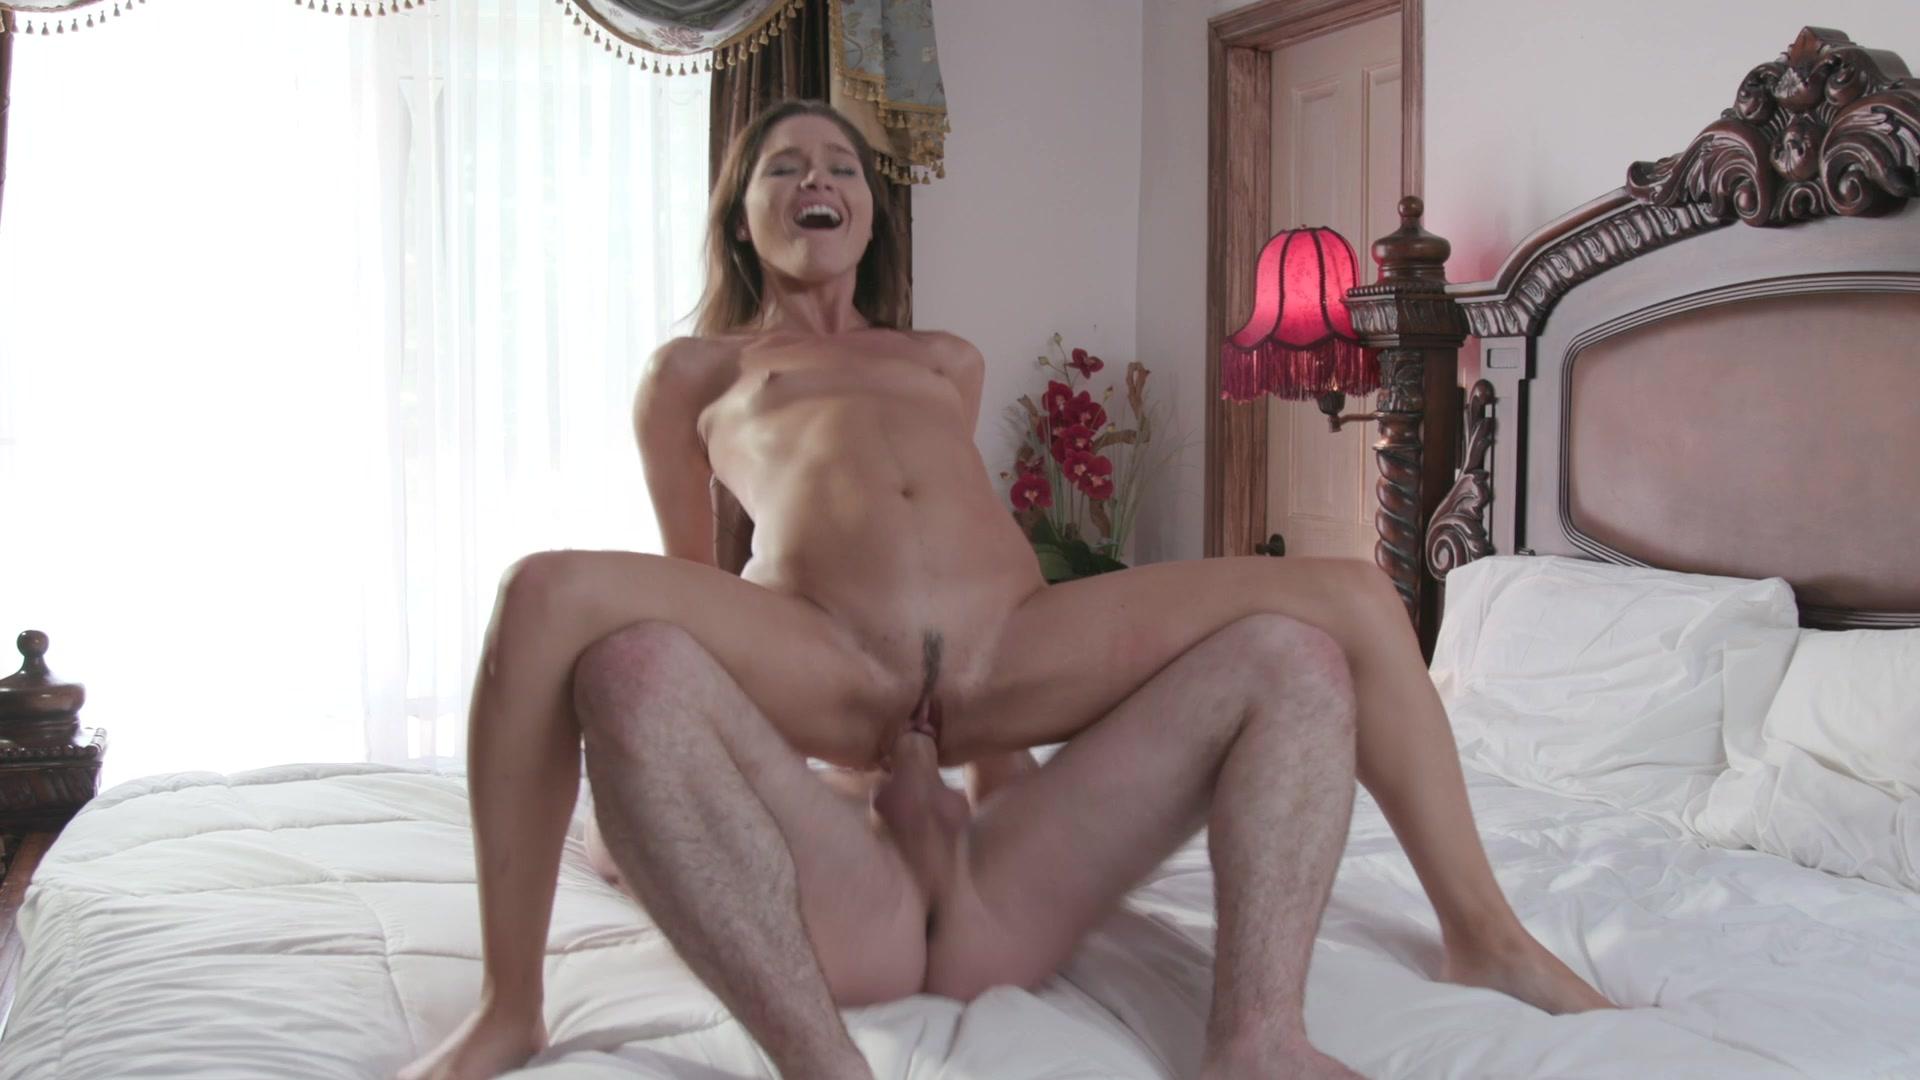 Trailers  My Best Friends Daughter 2 Porn Movie  Adult -1293